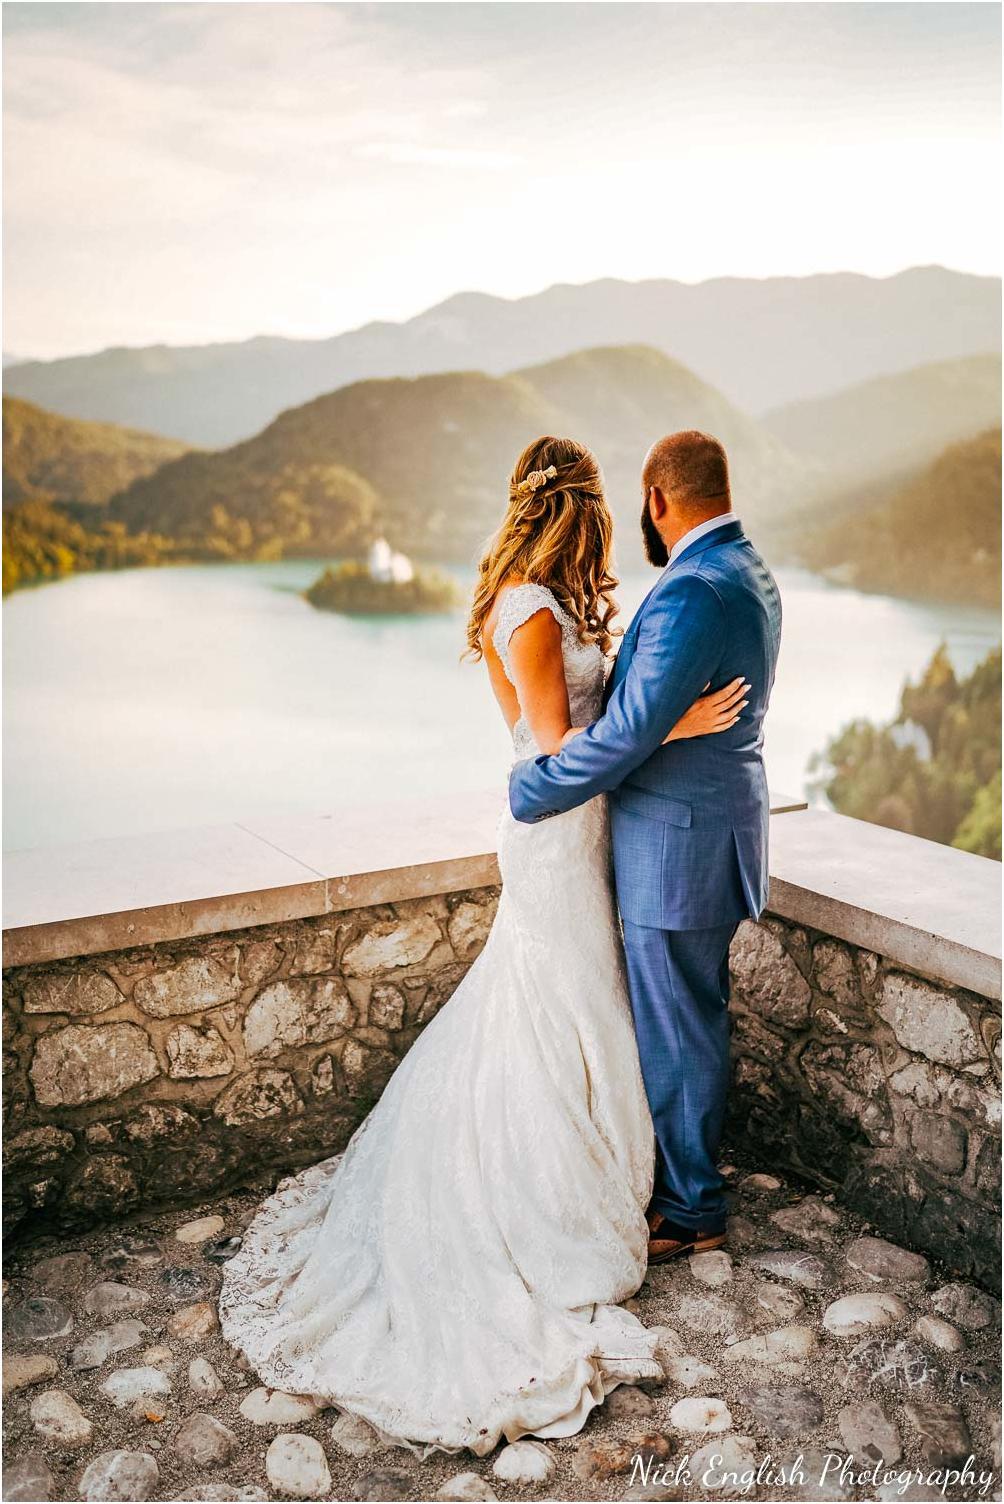 Destination_Wedding_Photographer_Slovenia_Nick_English_Photography-70-31.jpg